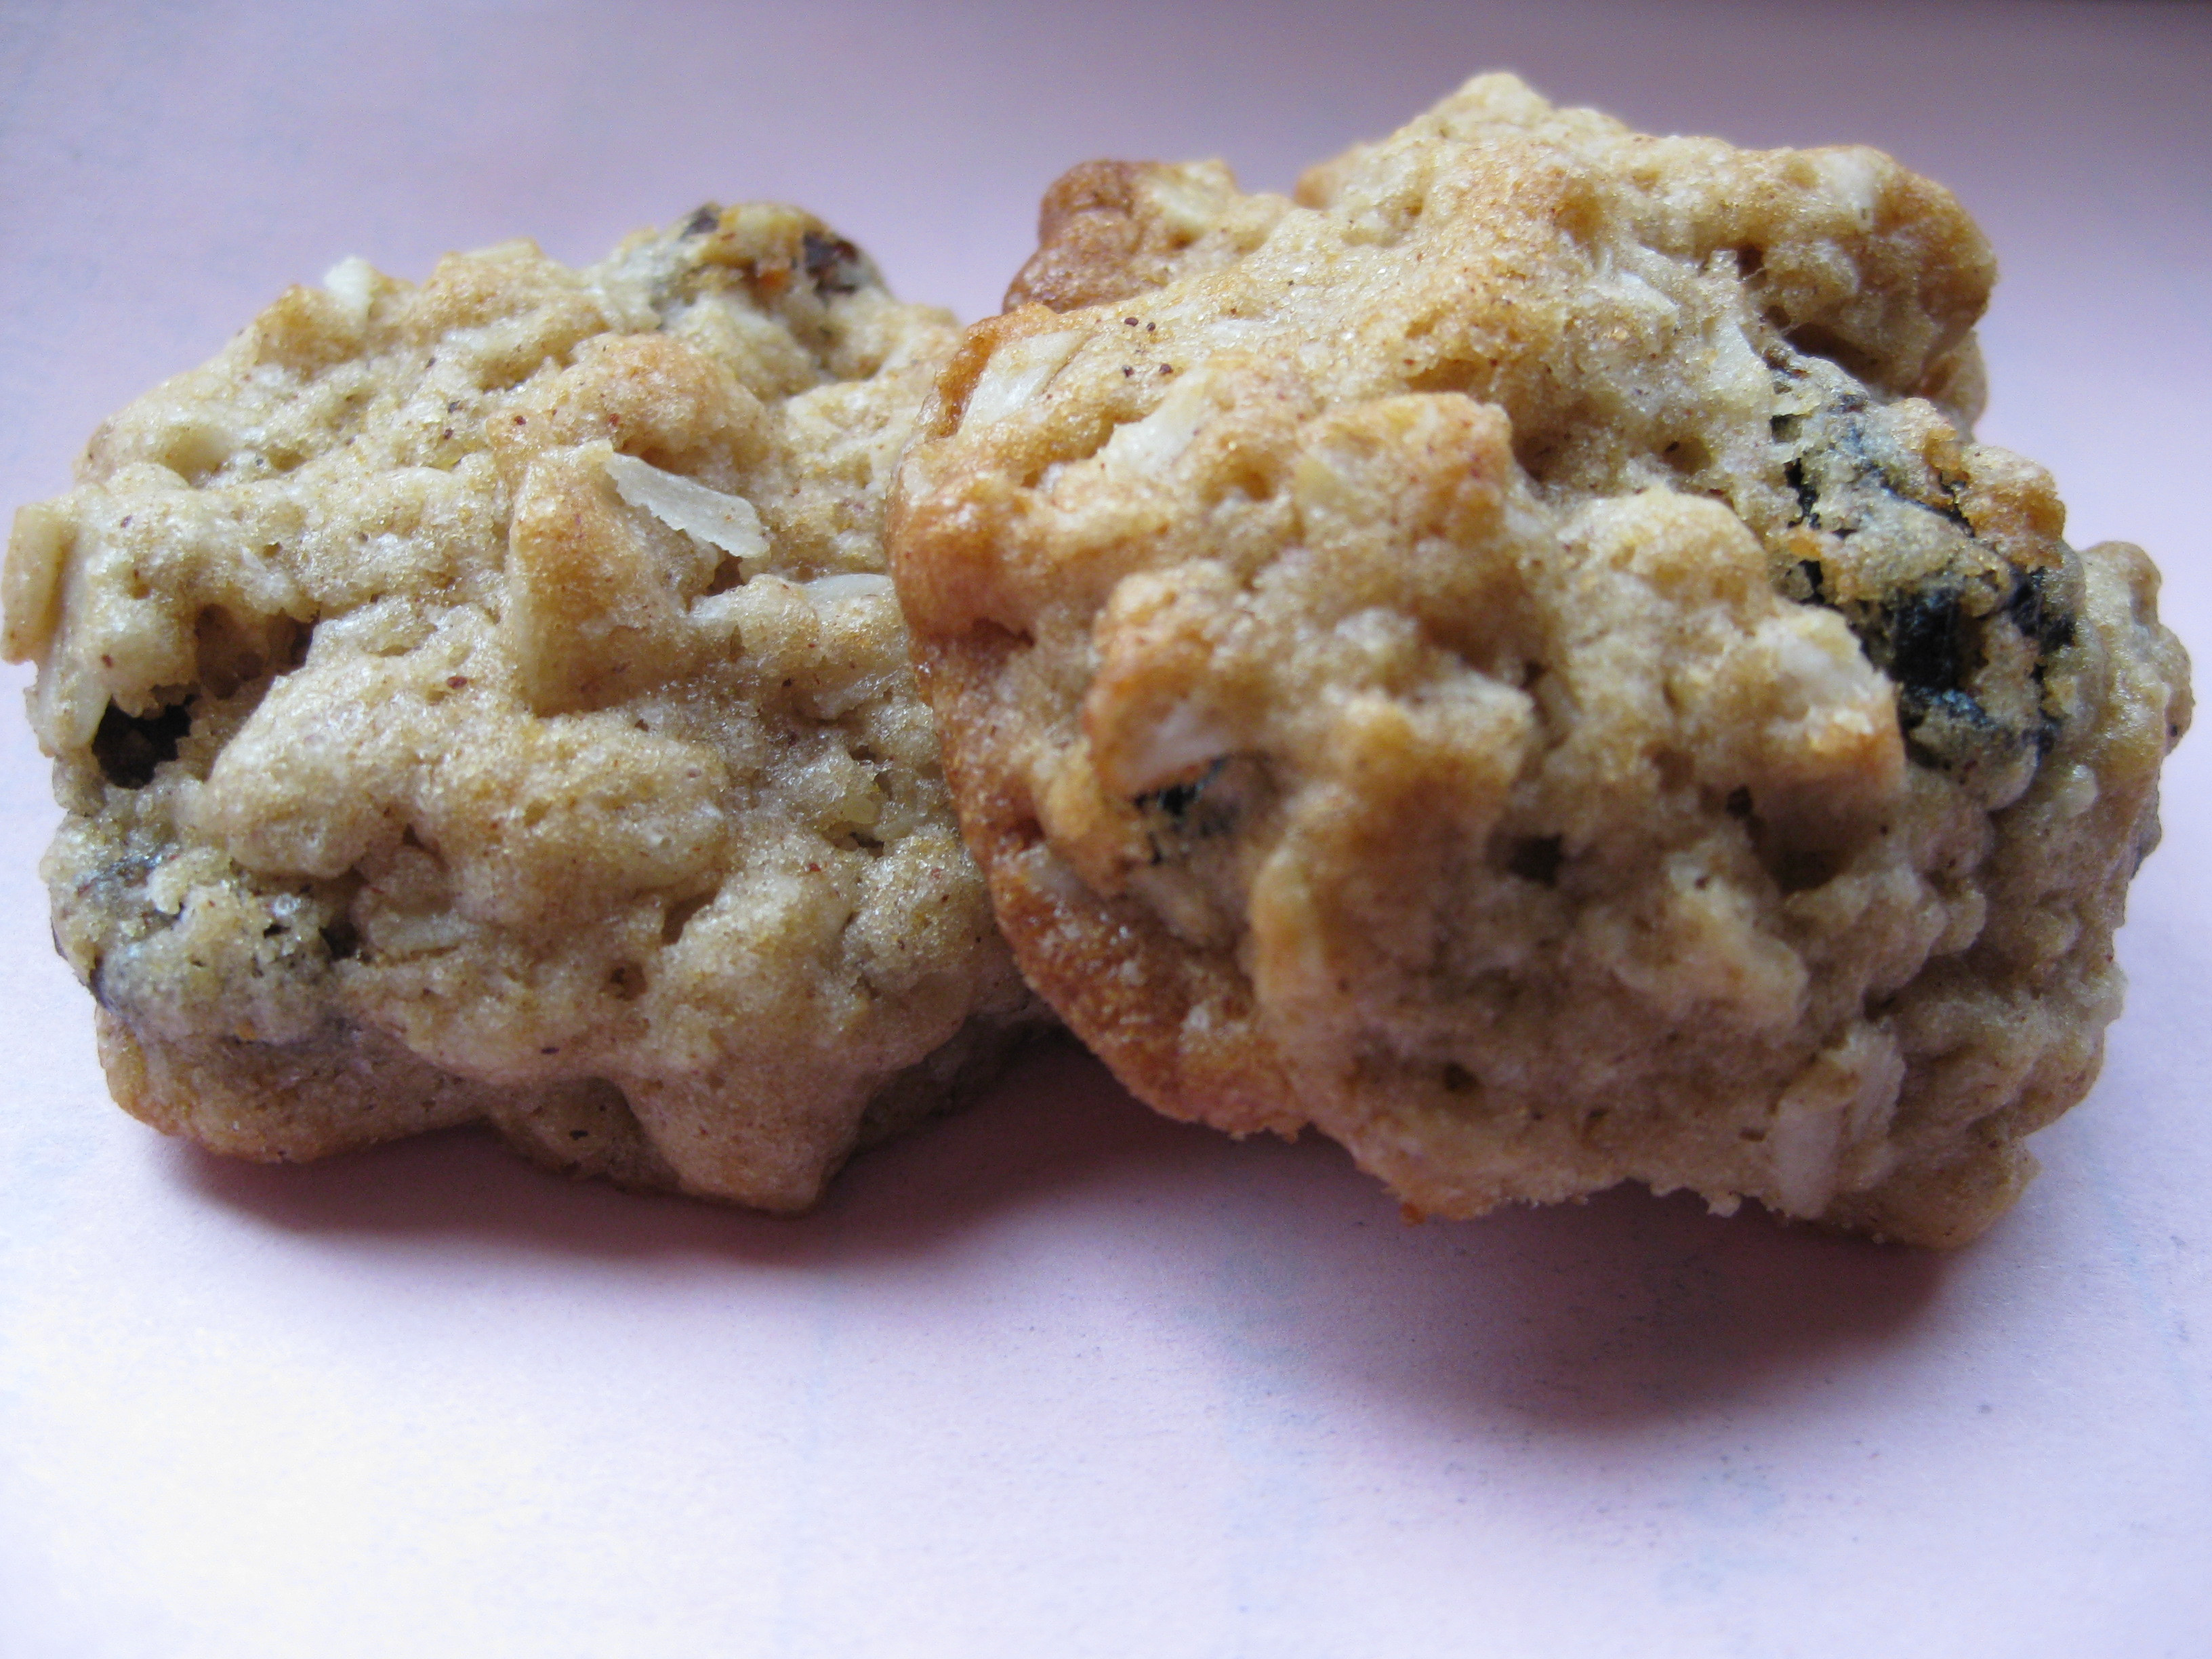 Healthy Oatmeal Raisin Cookies  Healthy Oatmeal Raisin Cookies